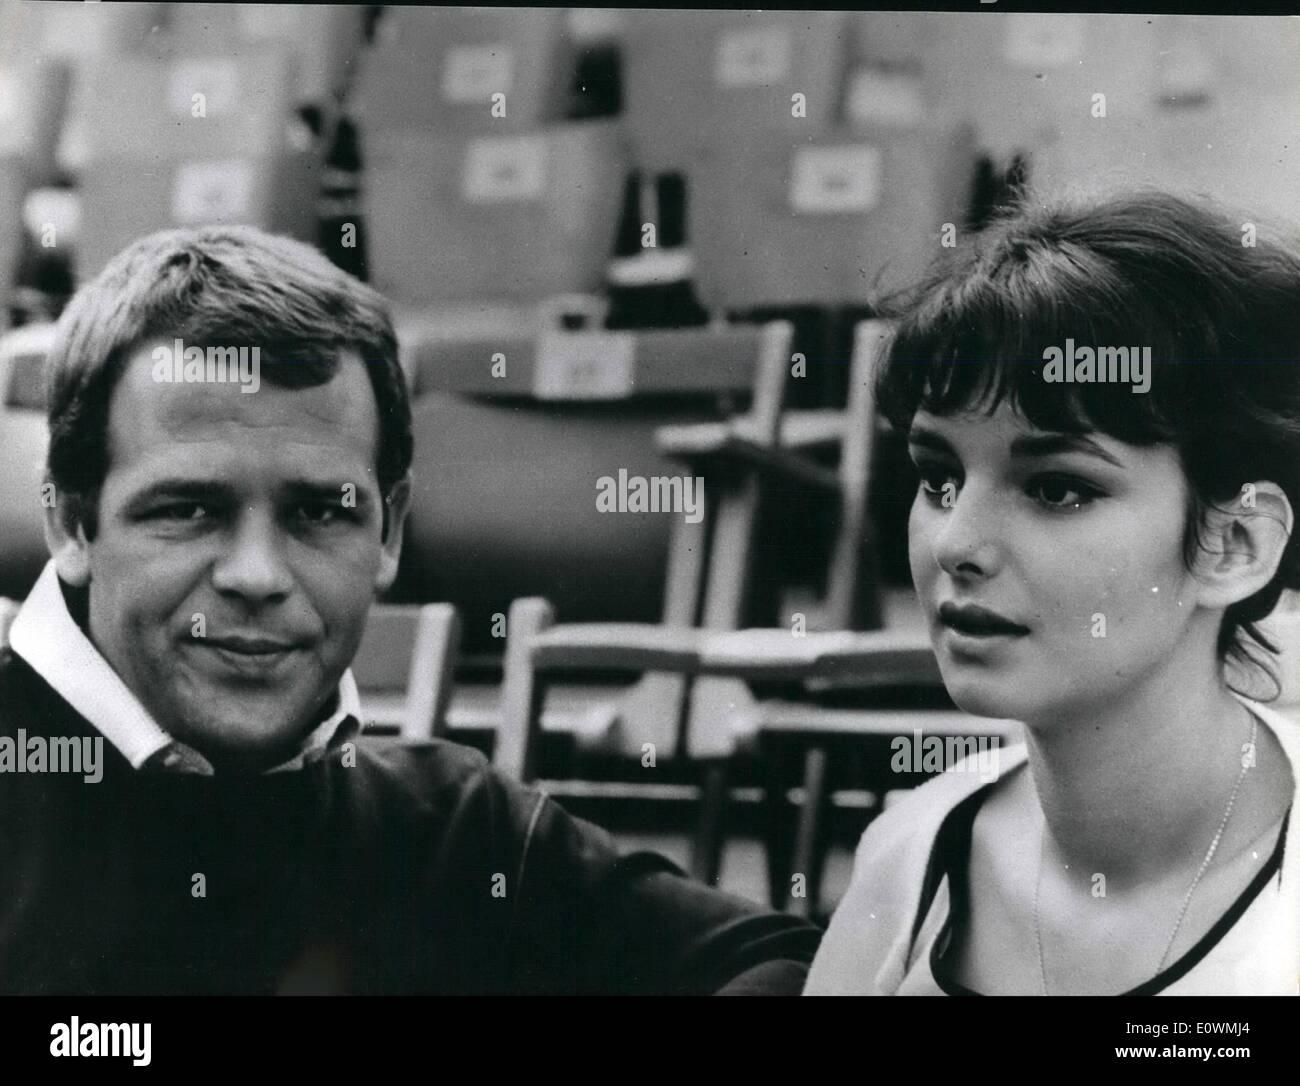 09, 1963 - Renato Salvatori has been chosen by director Gragoretti as best  actor in ''O~icron'' a film of ''fantascienza''